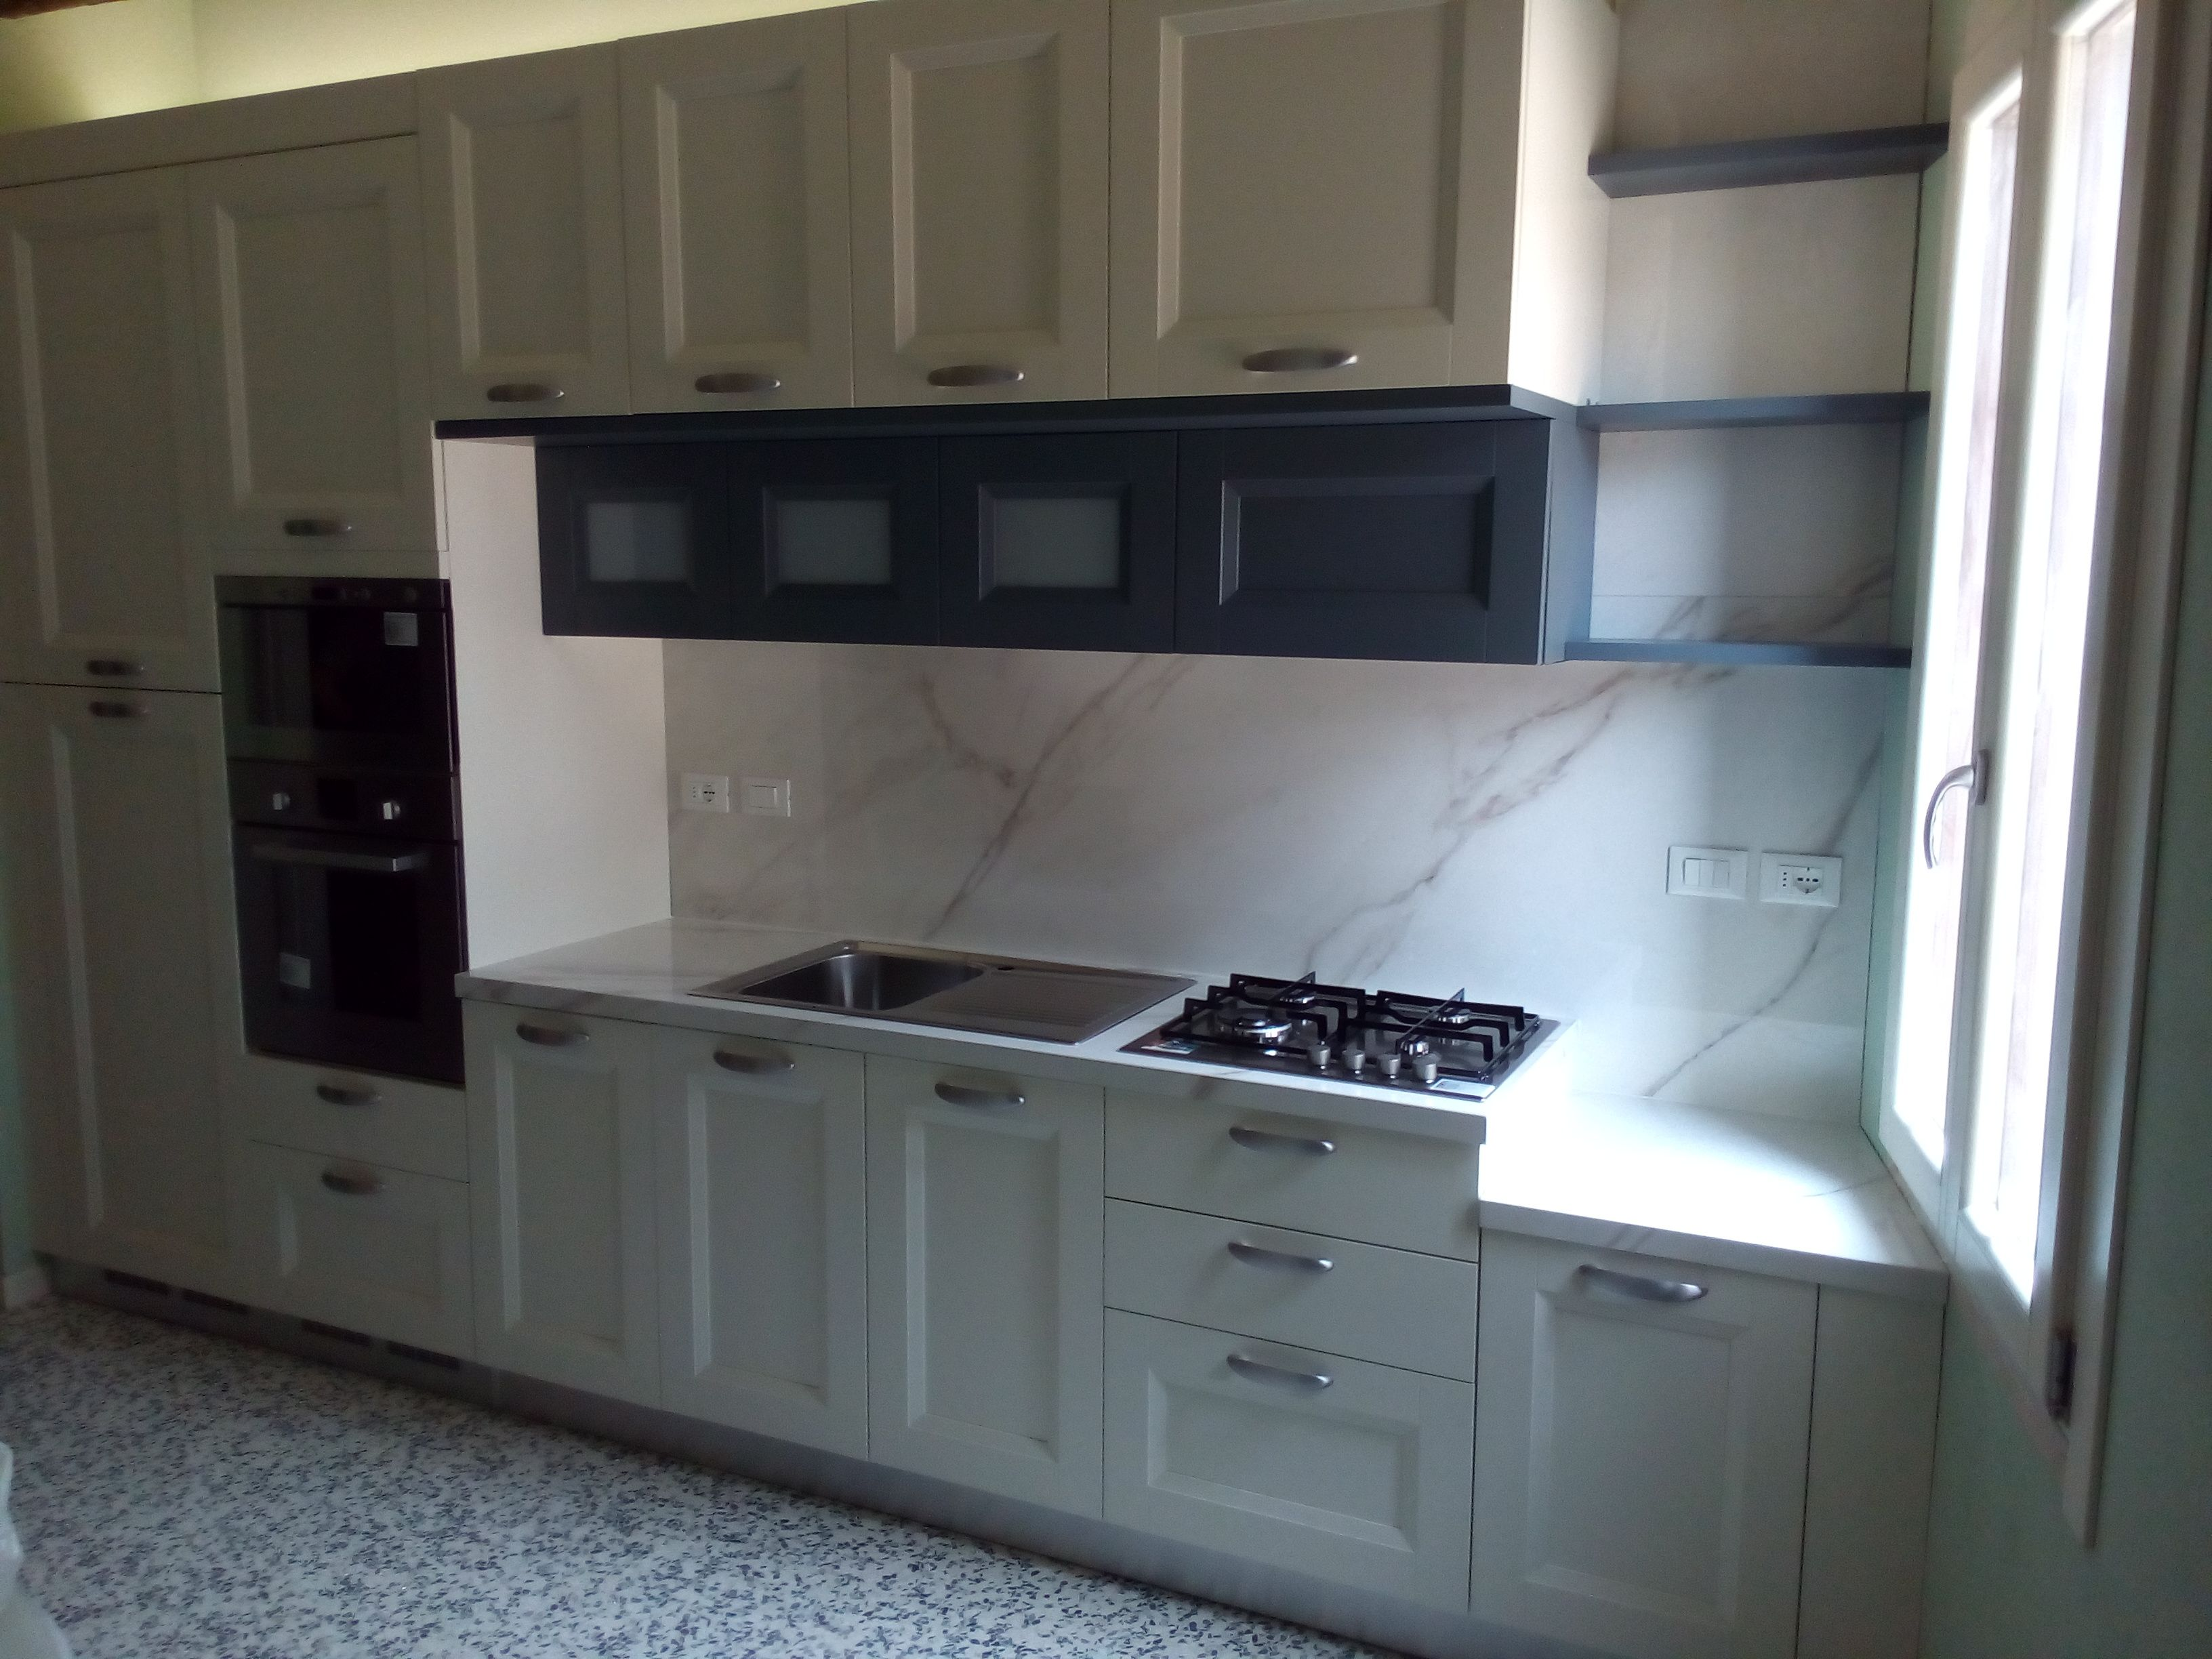 Top cucina kerlite - Piano cucina kerlite ...